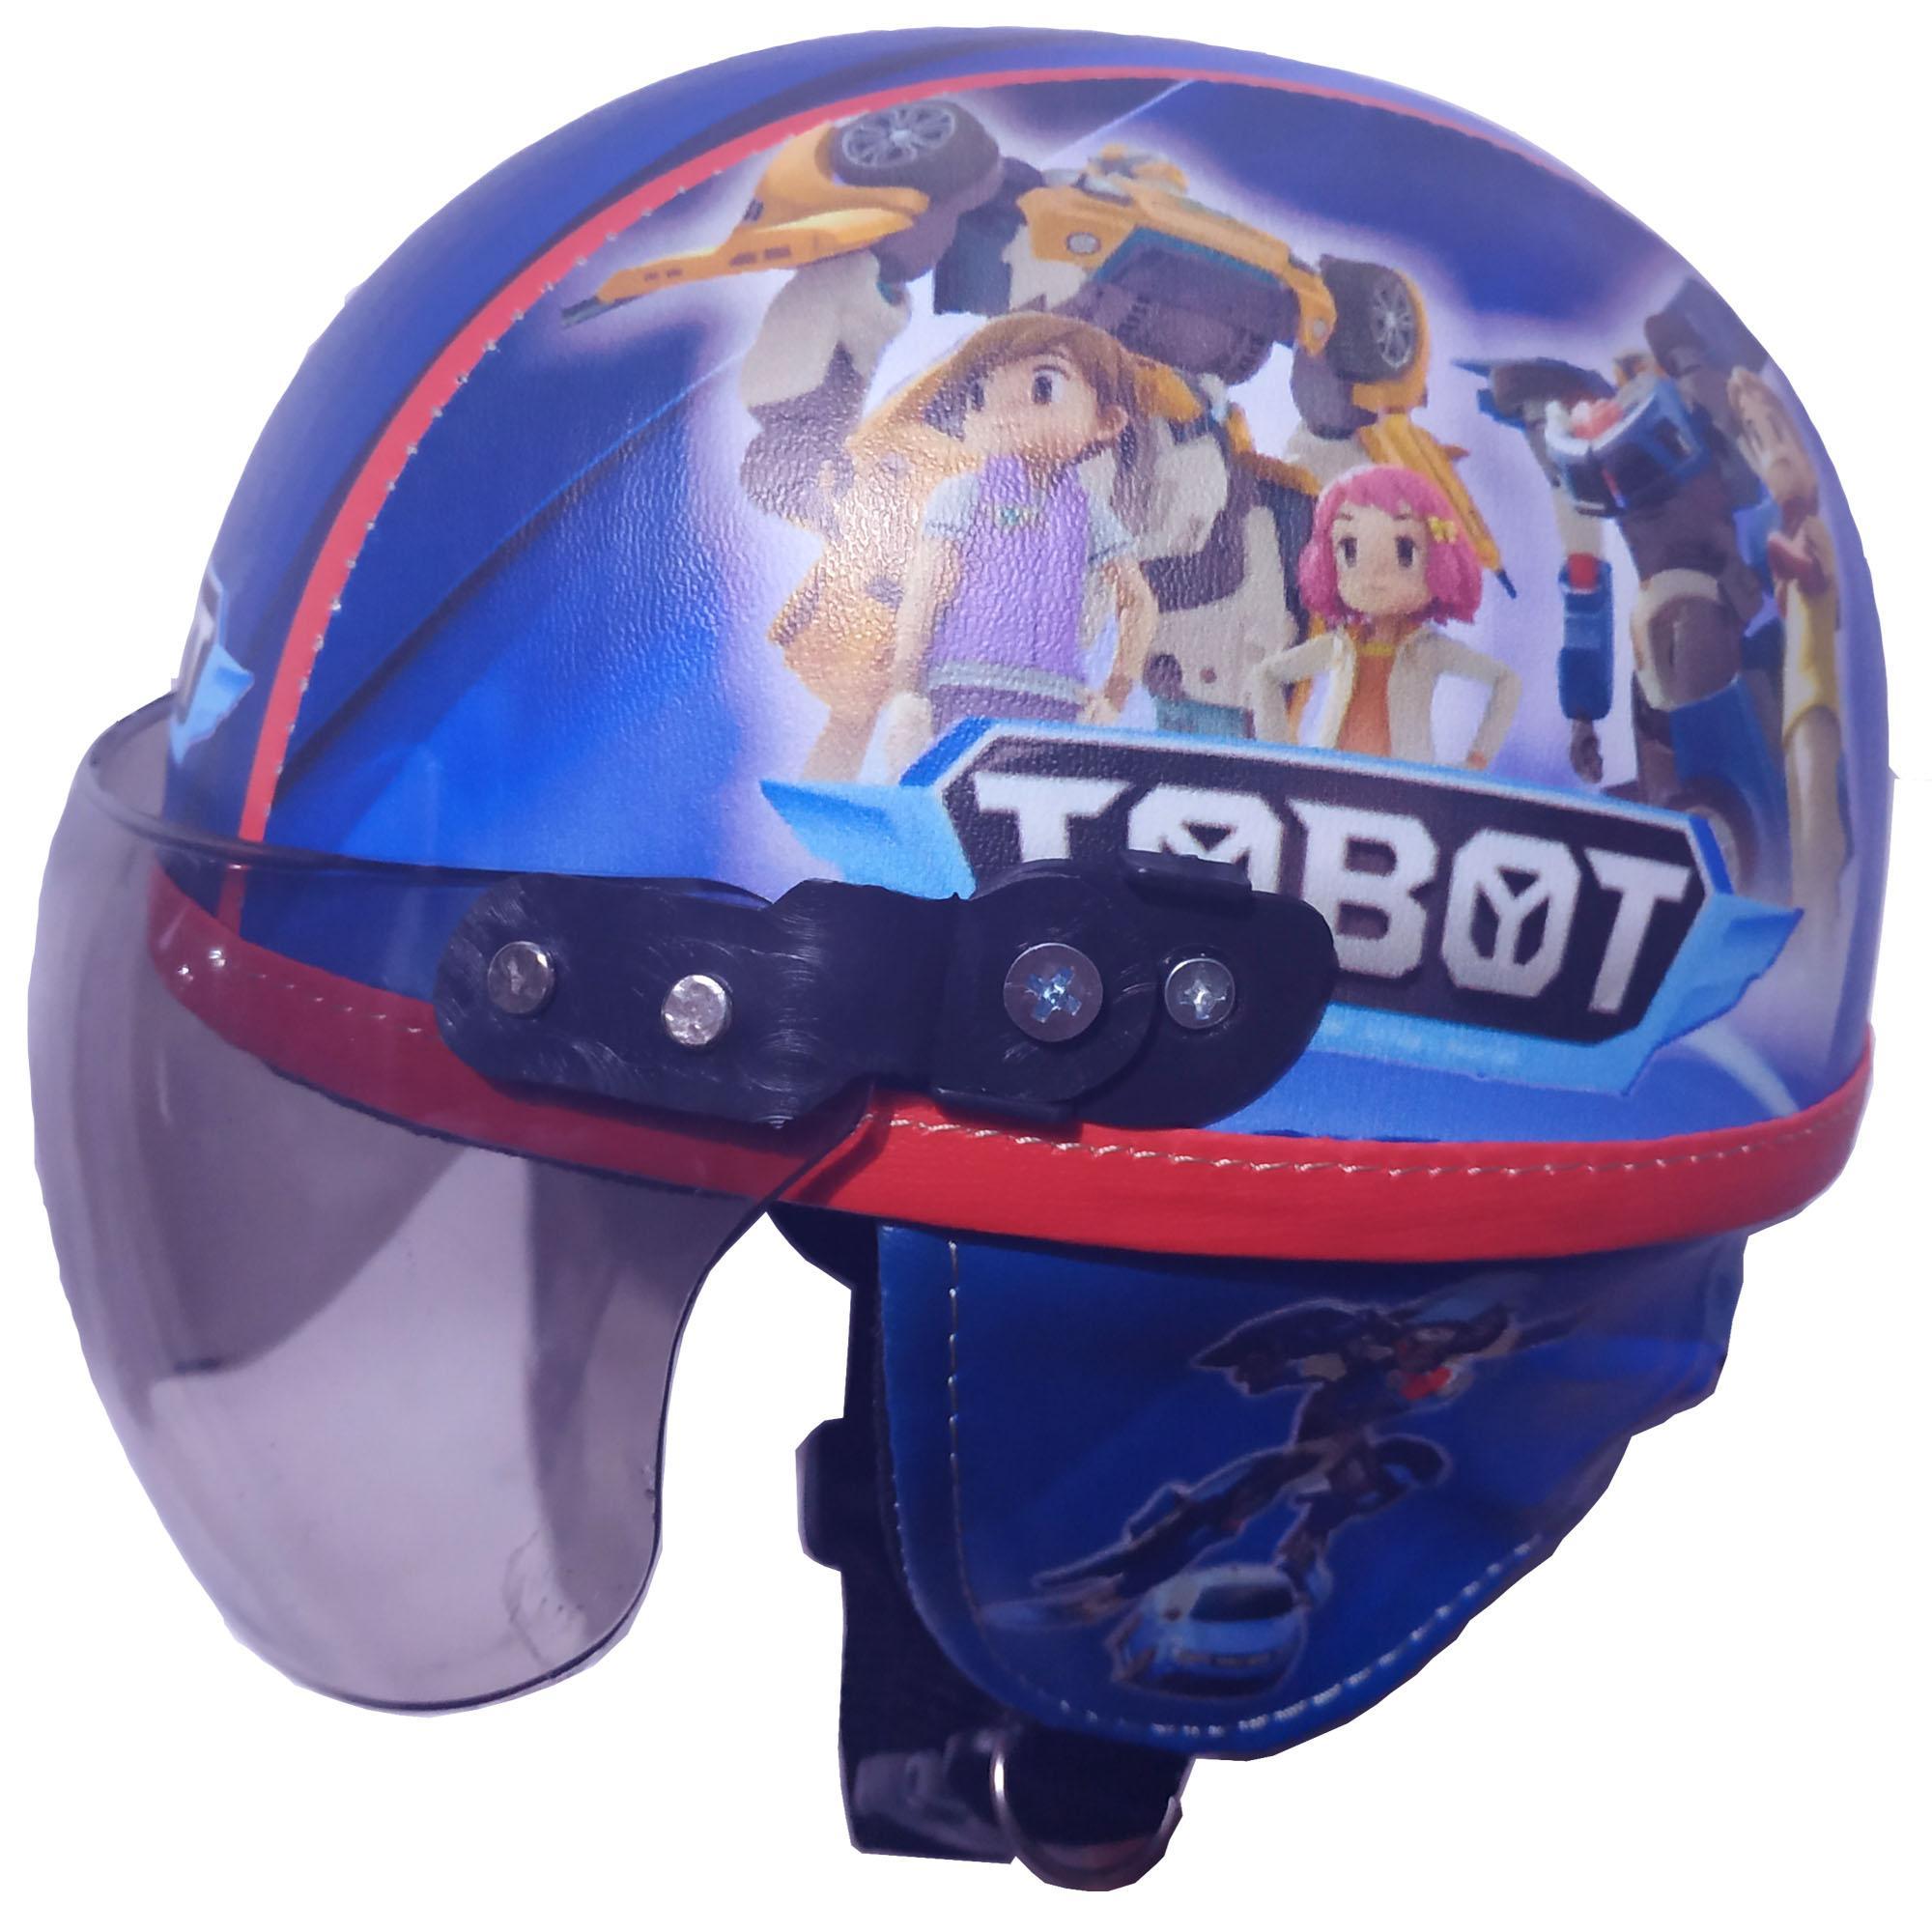 Helm Anak Lucu Spesial Edition Allsize Untuk Usia 1-4 Tahun Motif Tobot Biru Printing By Jelazada.